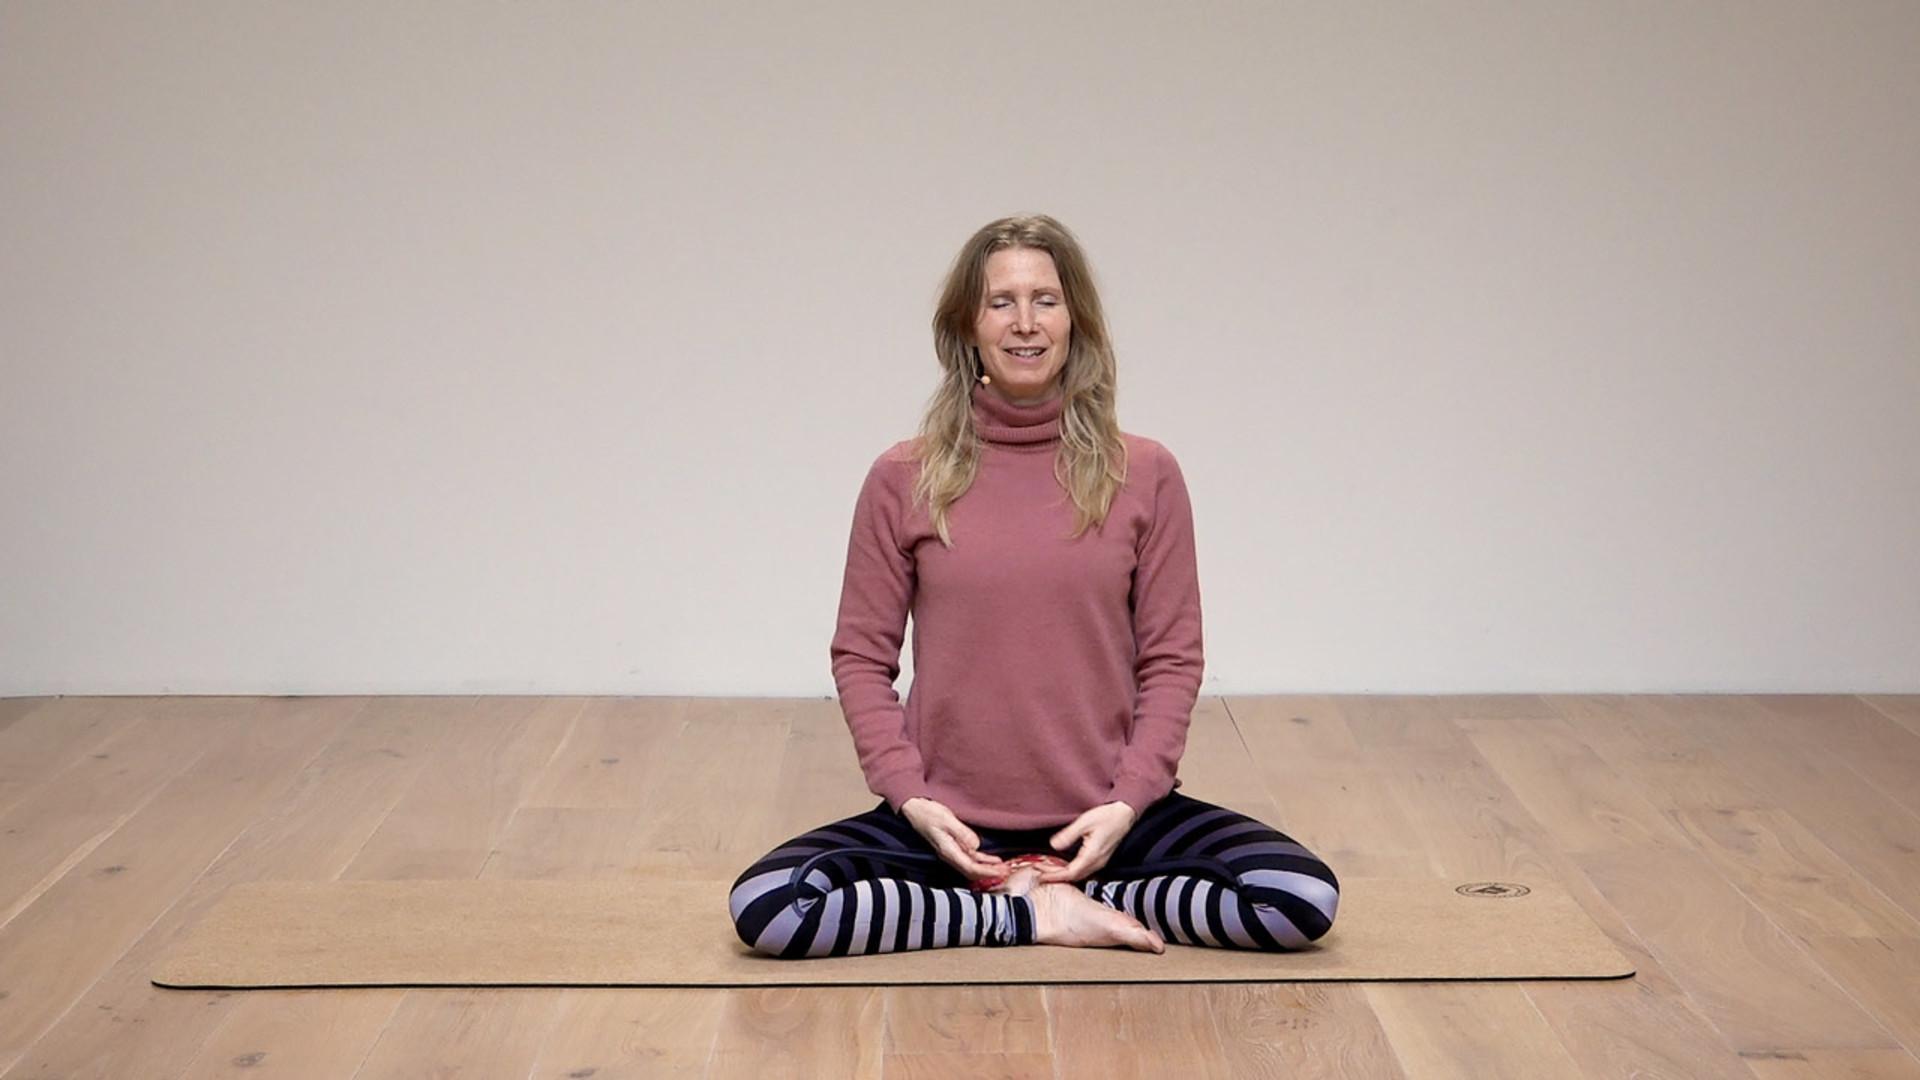 Ester Ekhart practicing yoga